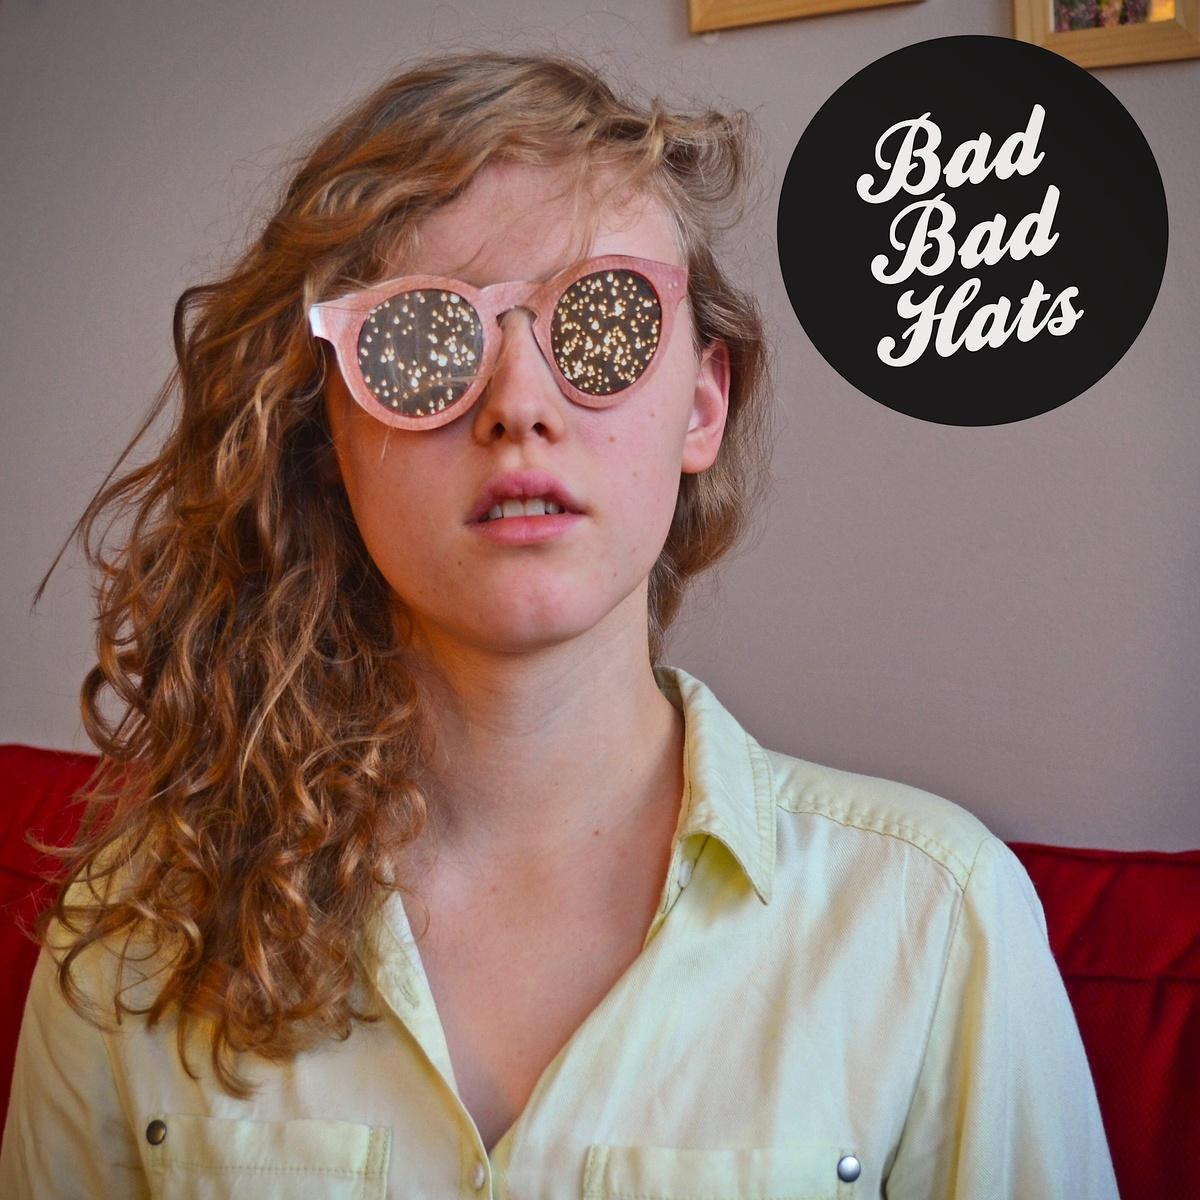 Bad Bad Hats - It Hurts